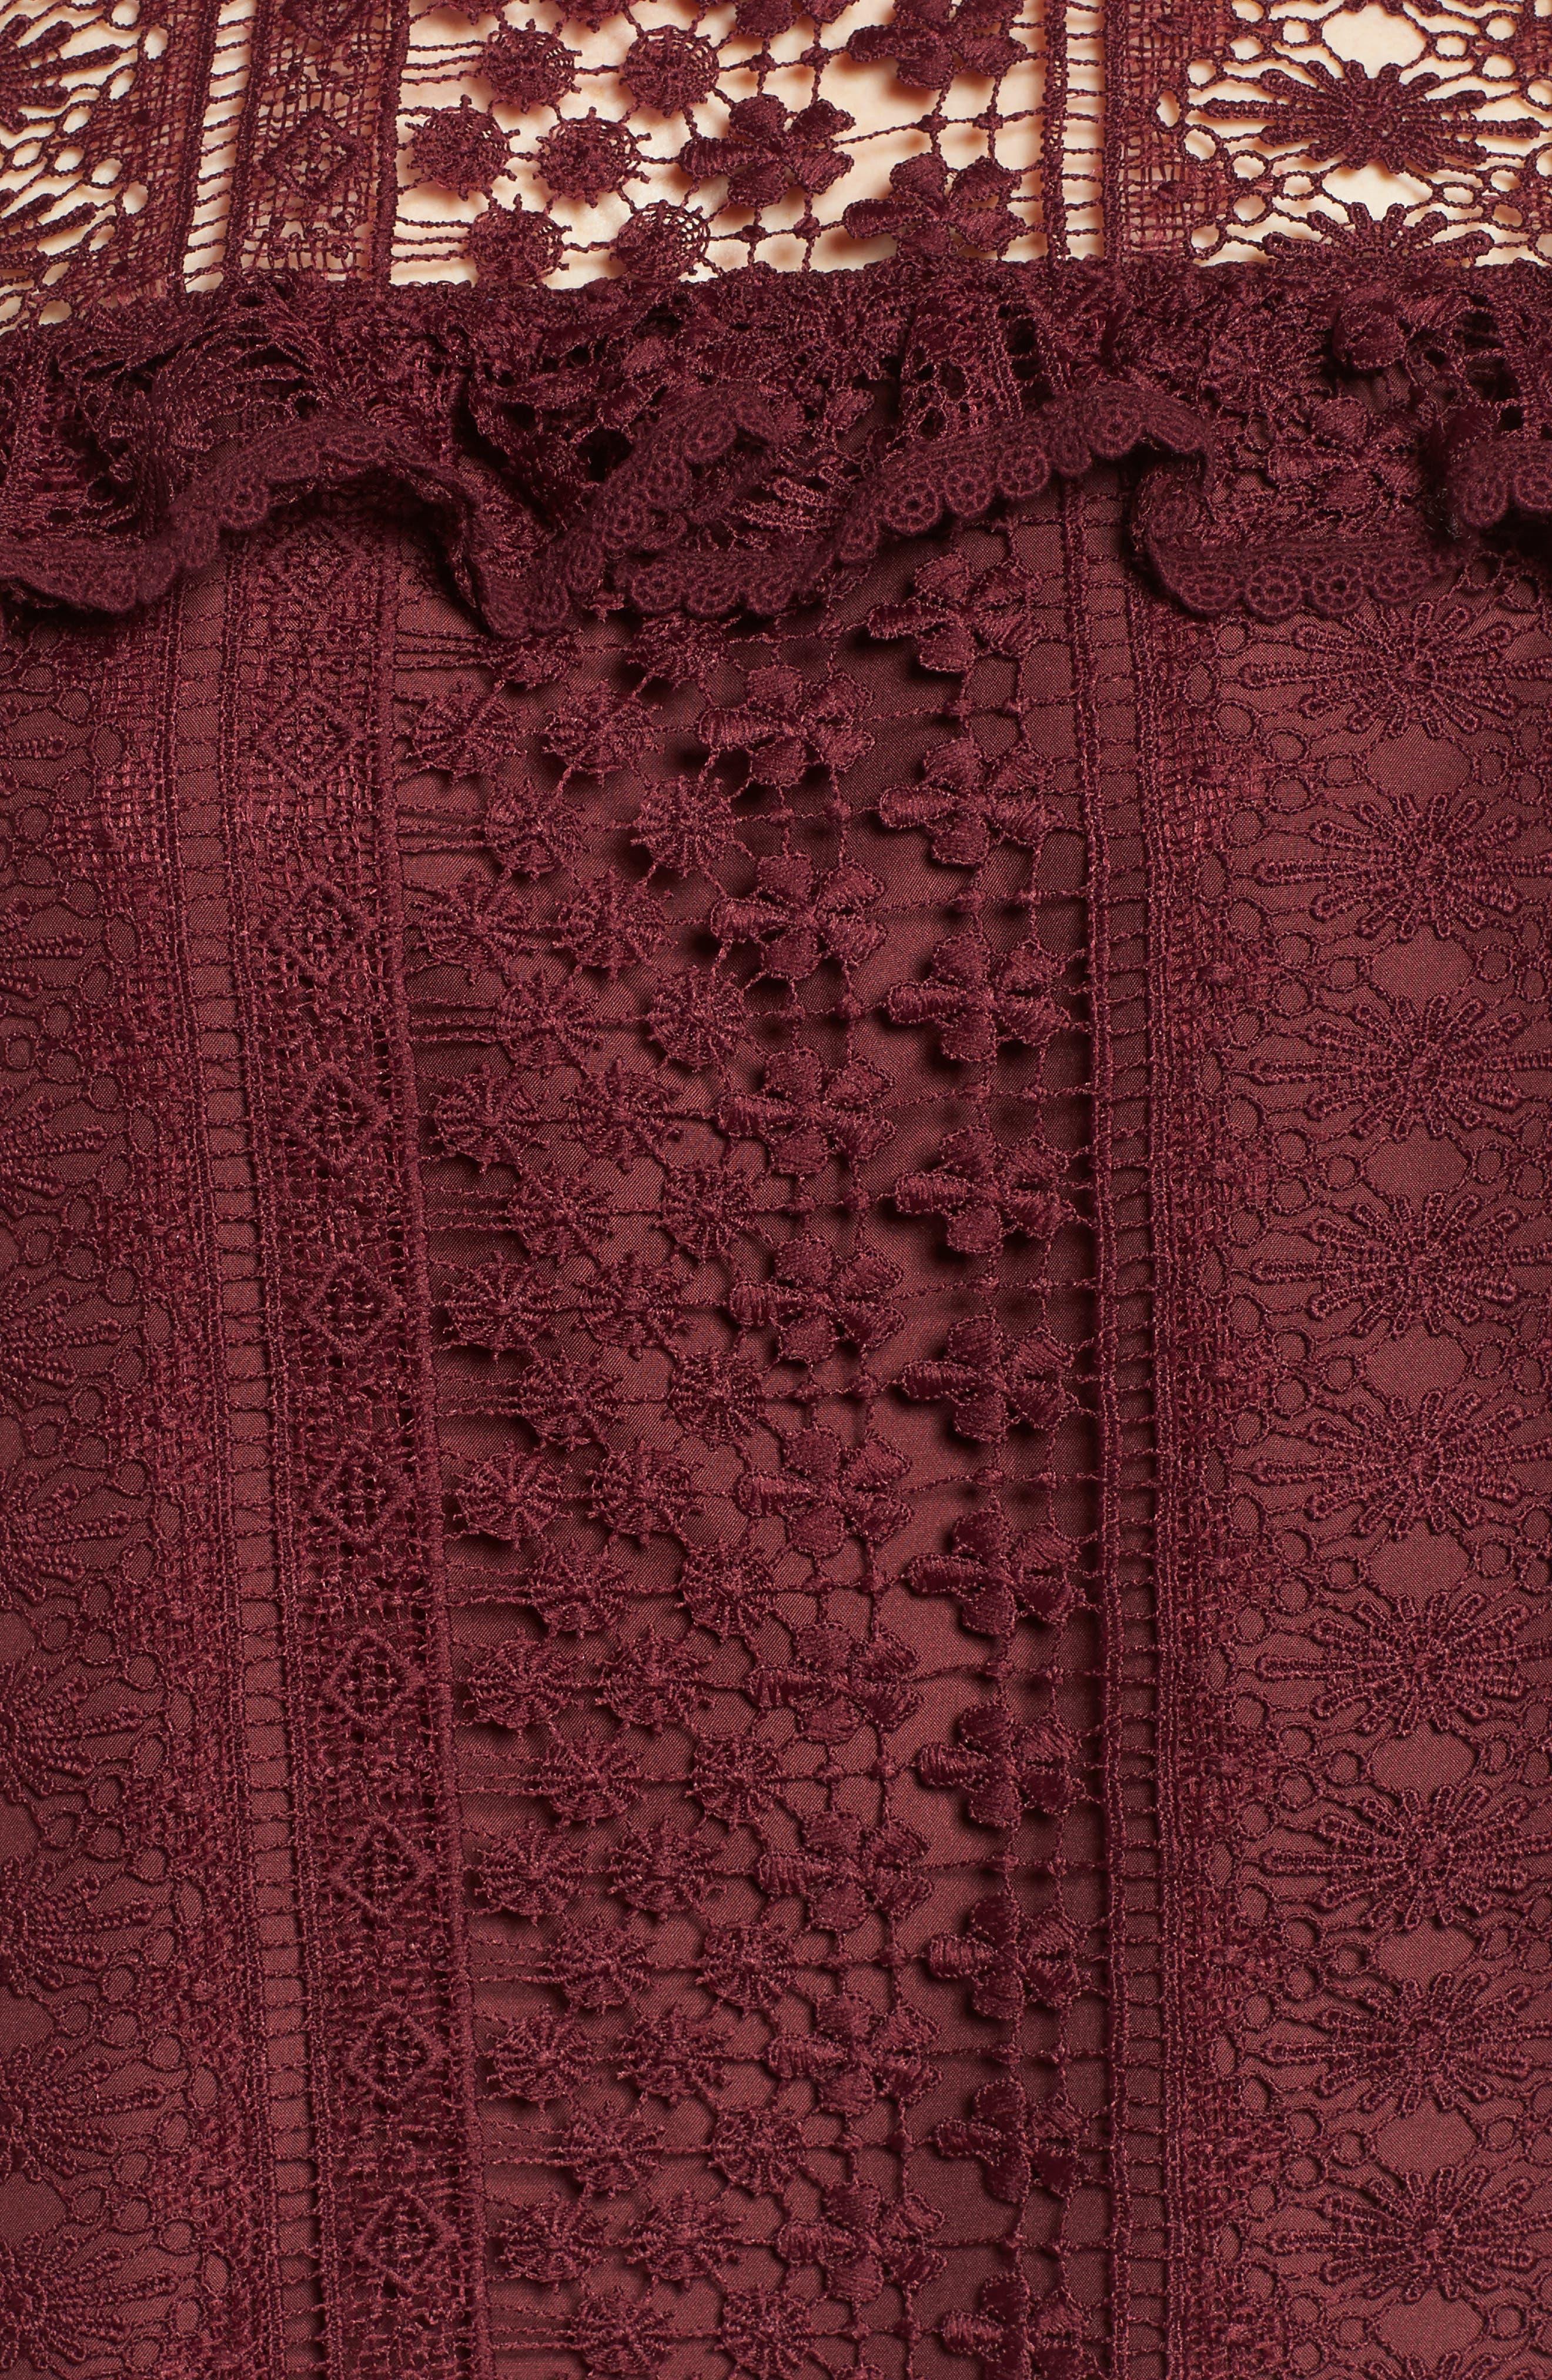 Kebecka Lace Top,                             Alternate thumbnail 5, color,                             Malbec